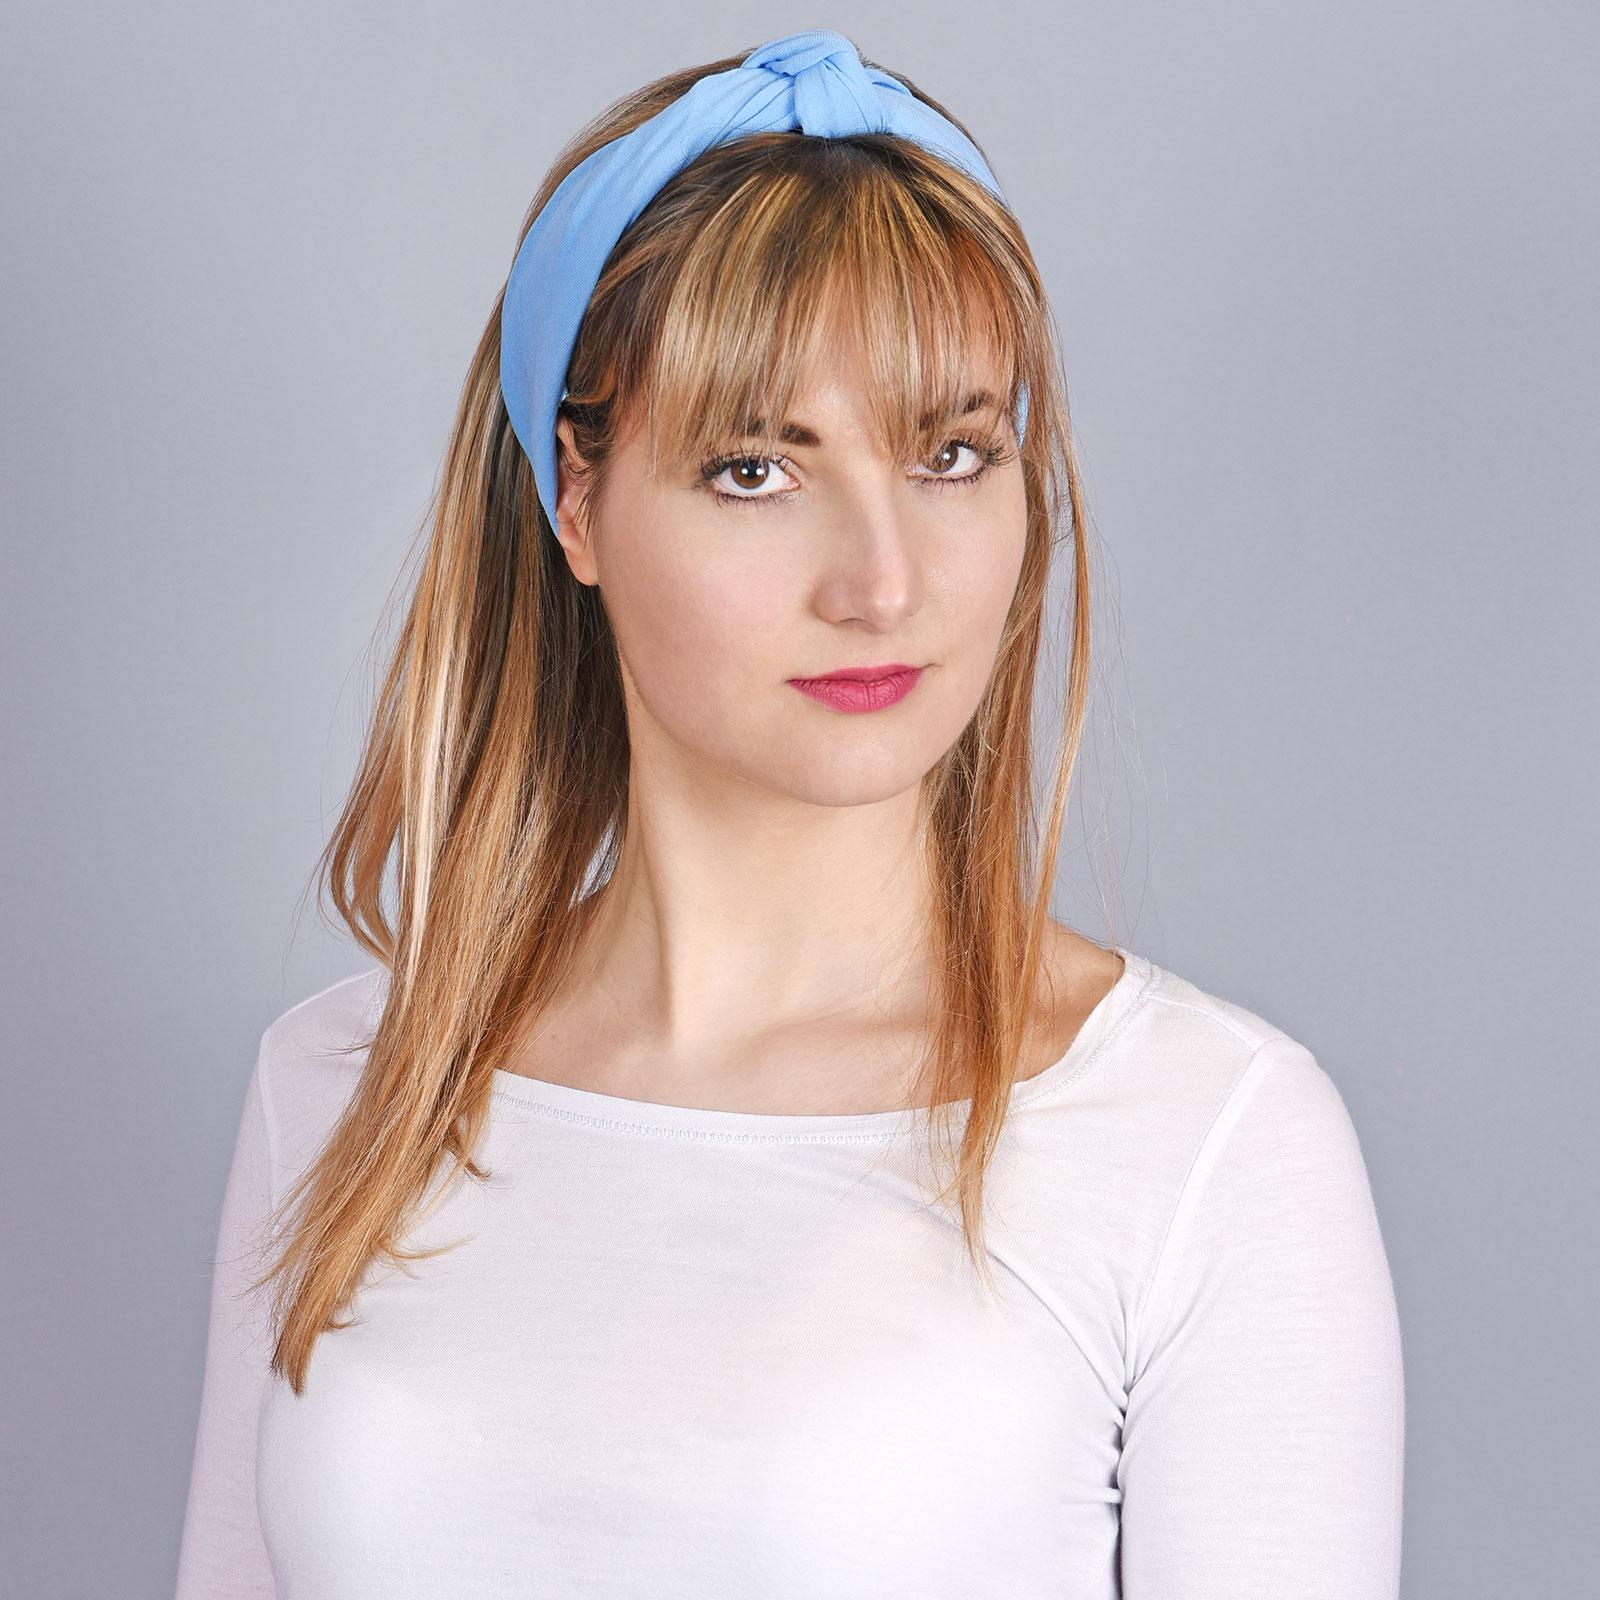 AT-04304-VF16-2-foulard-bandana-bleu-clair 6d2d28a7a16